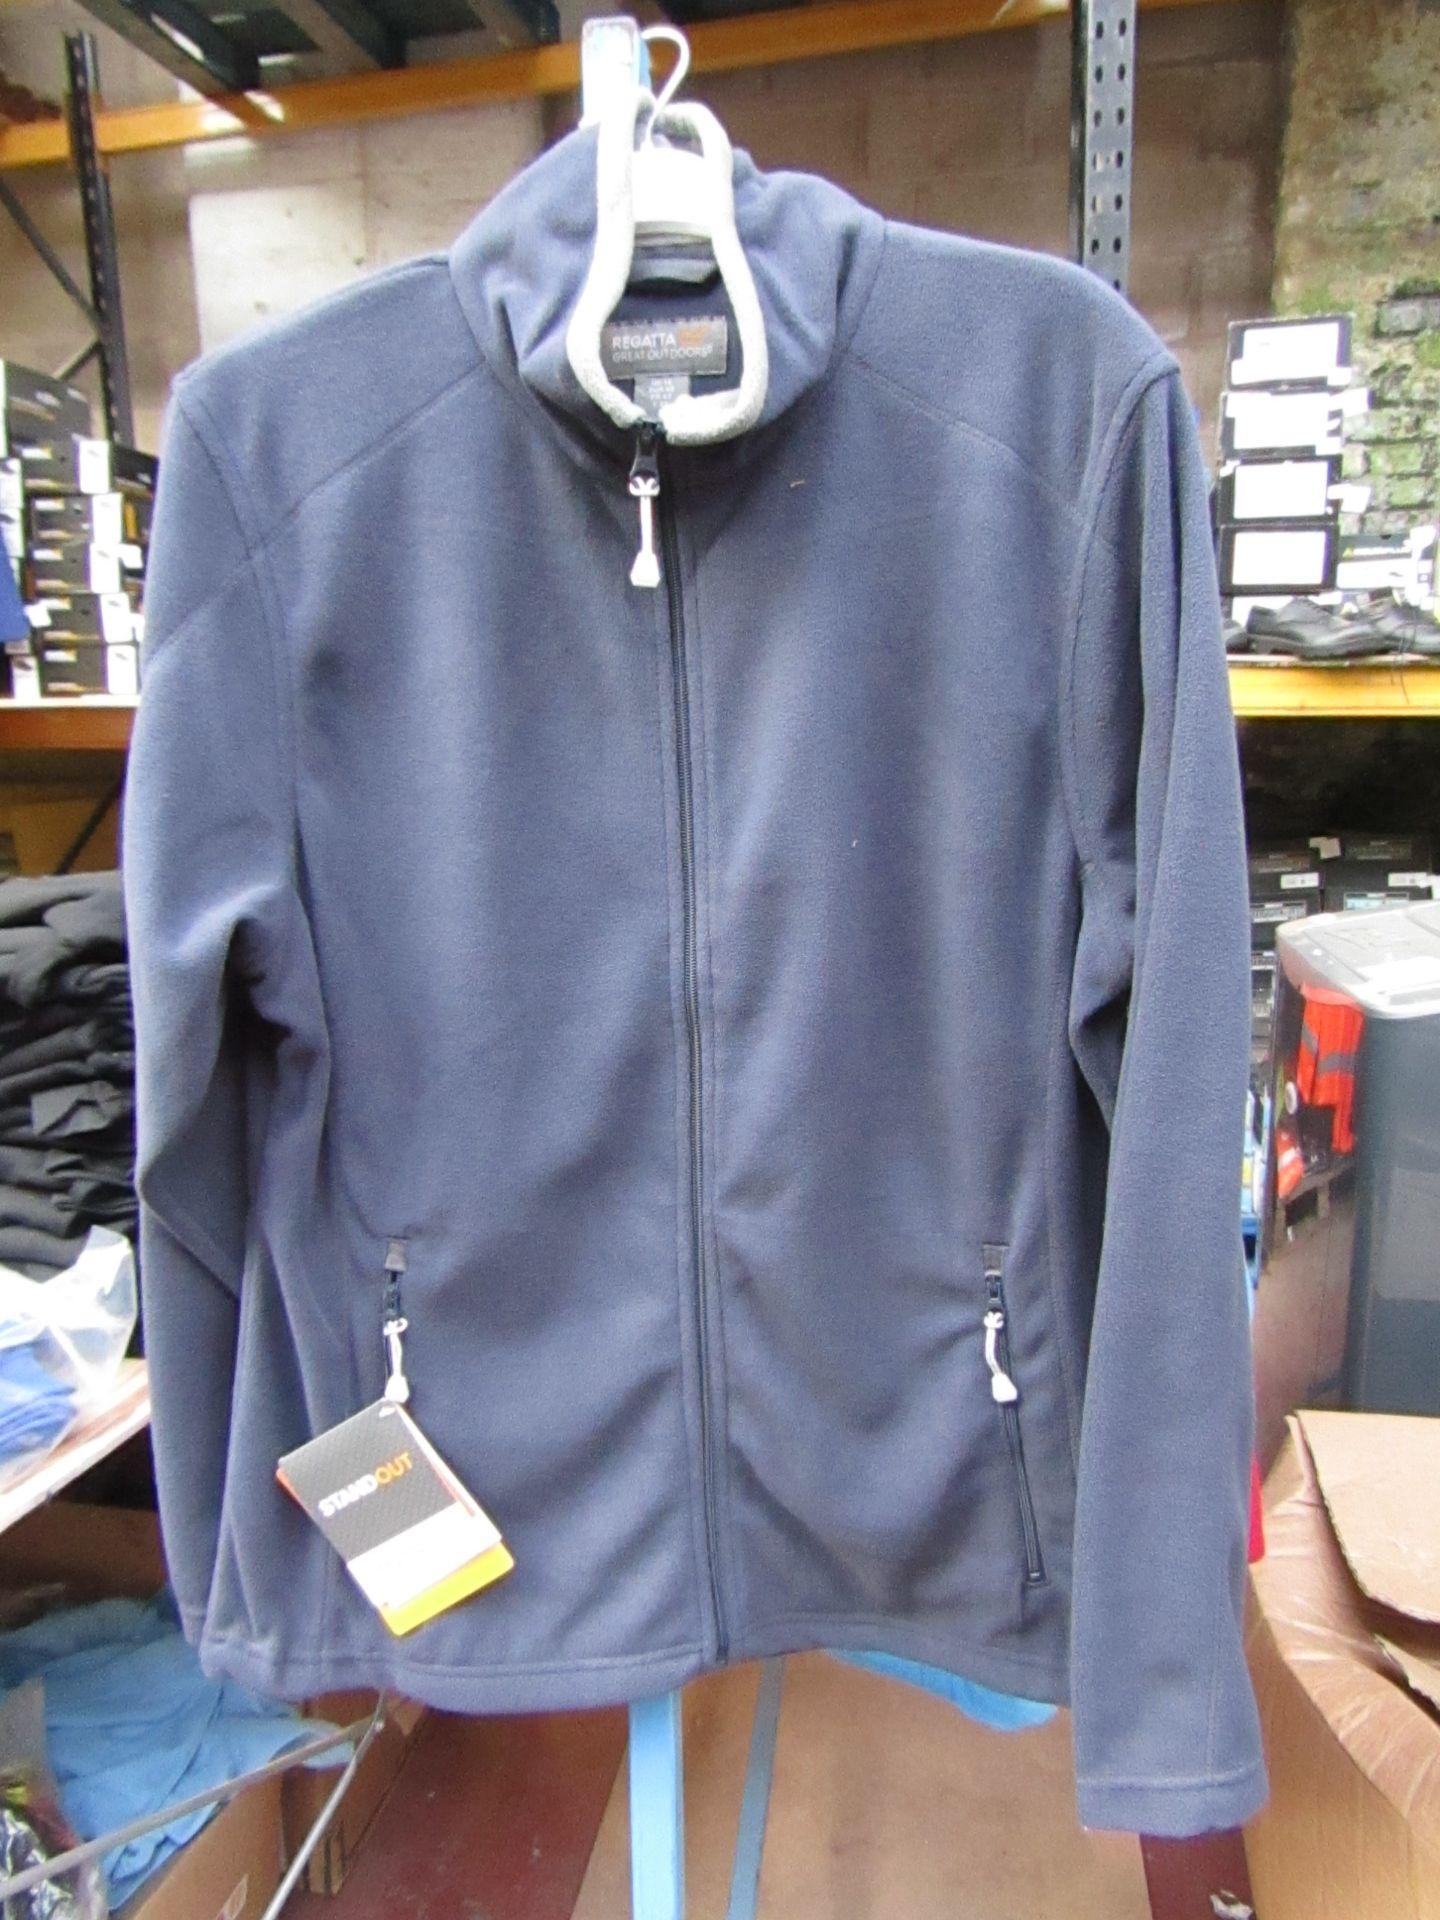 Lot 44 - Ladies Regatta Professional Fleece Navy / Smoke. Size 14. new in Packaging